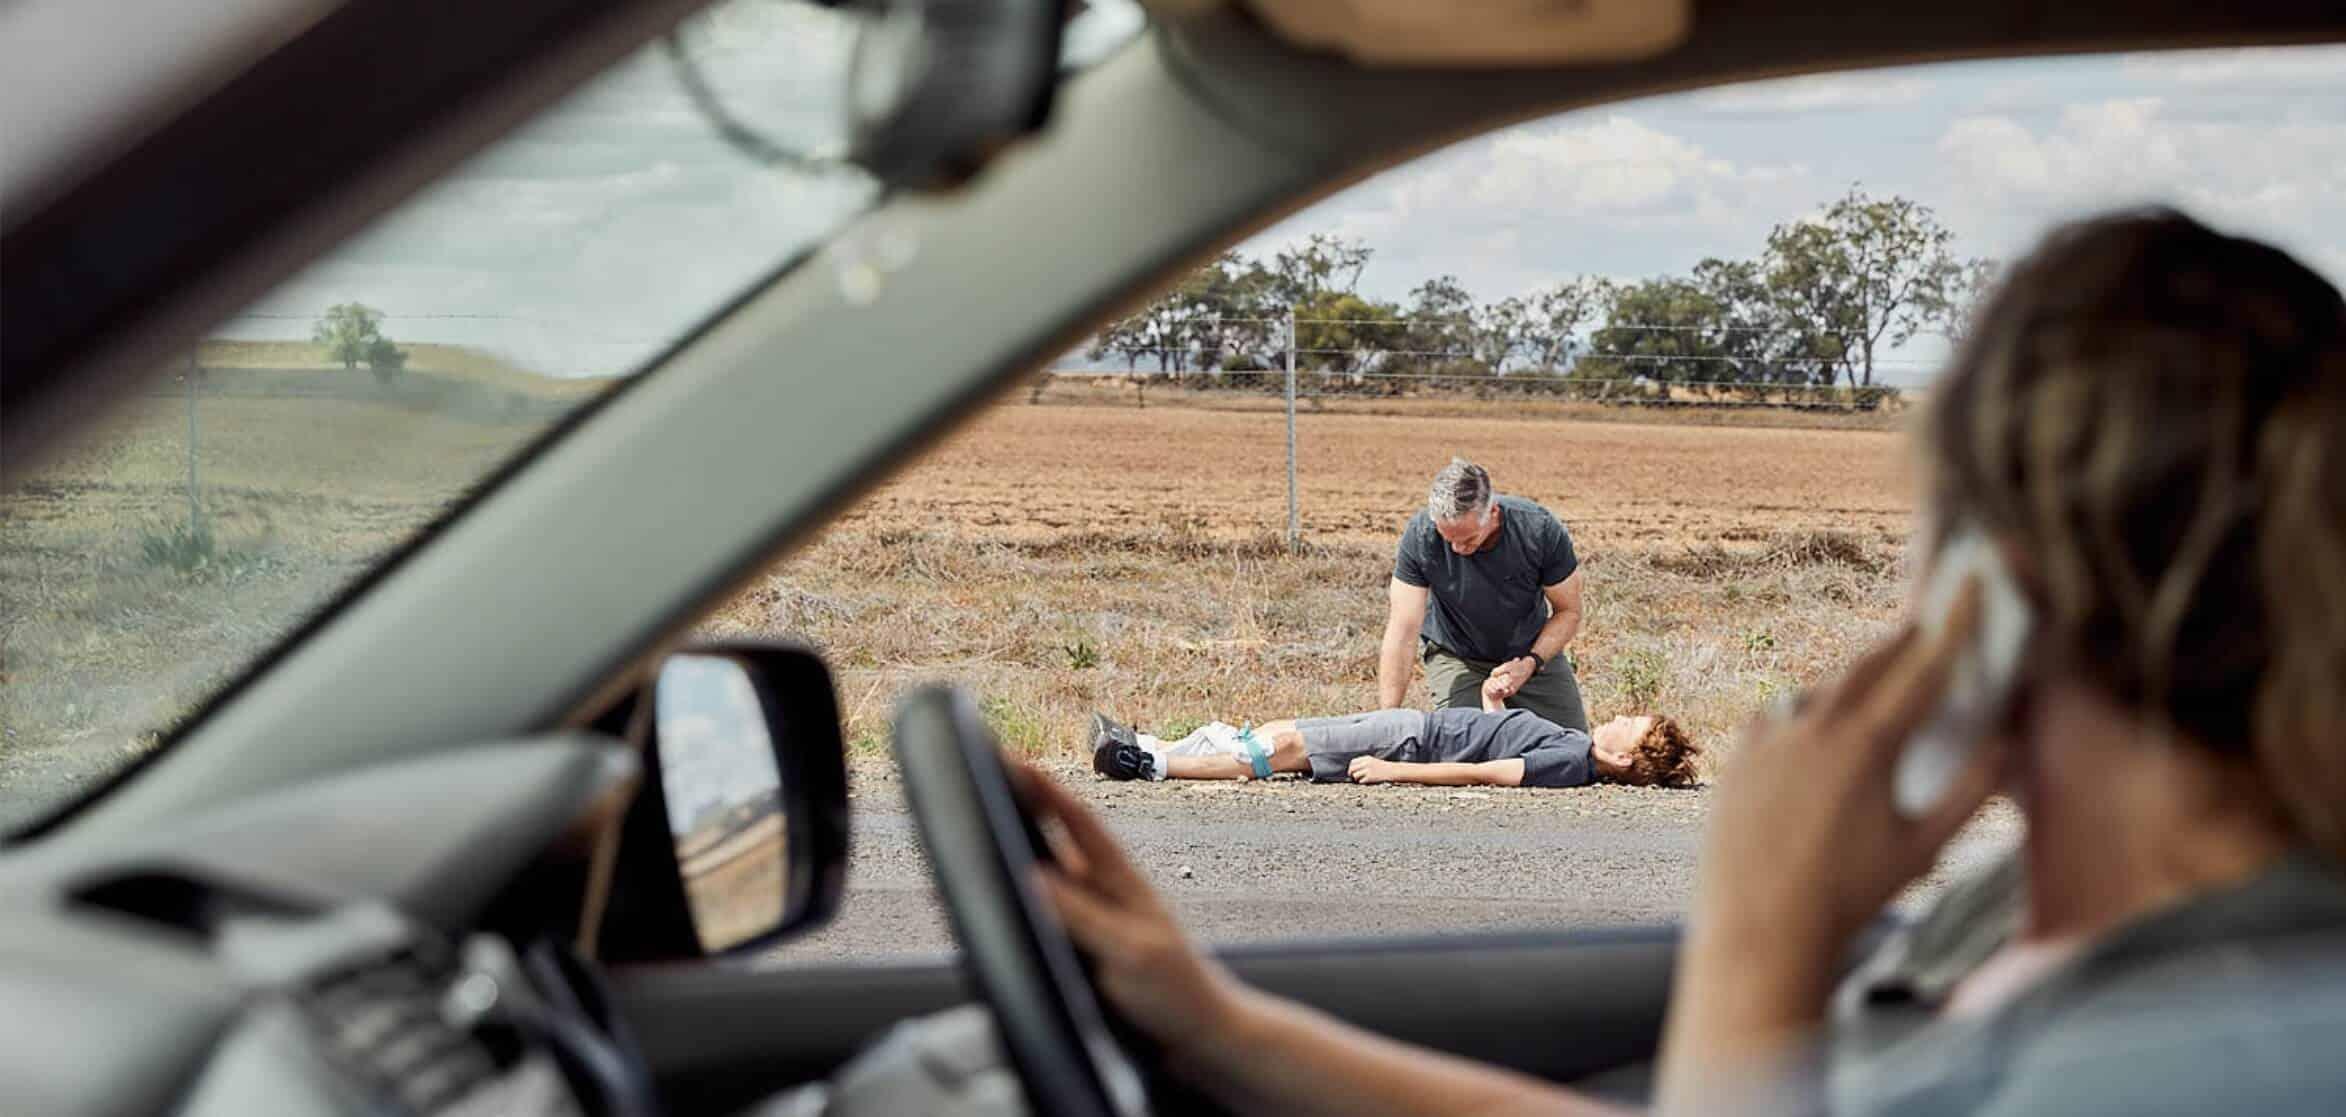 First on scene trauma training